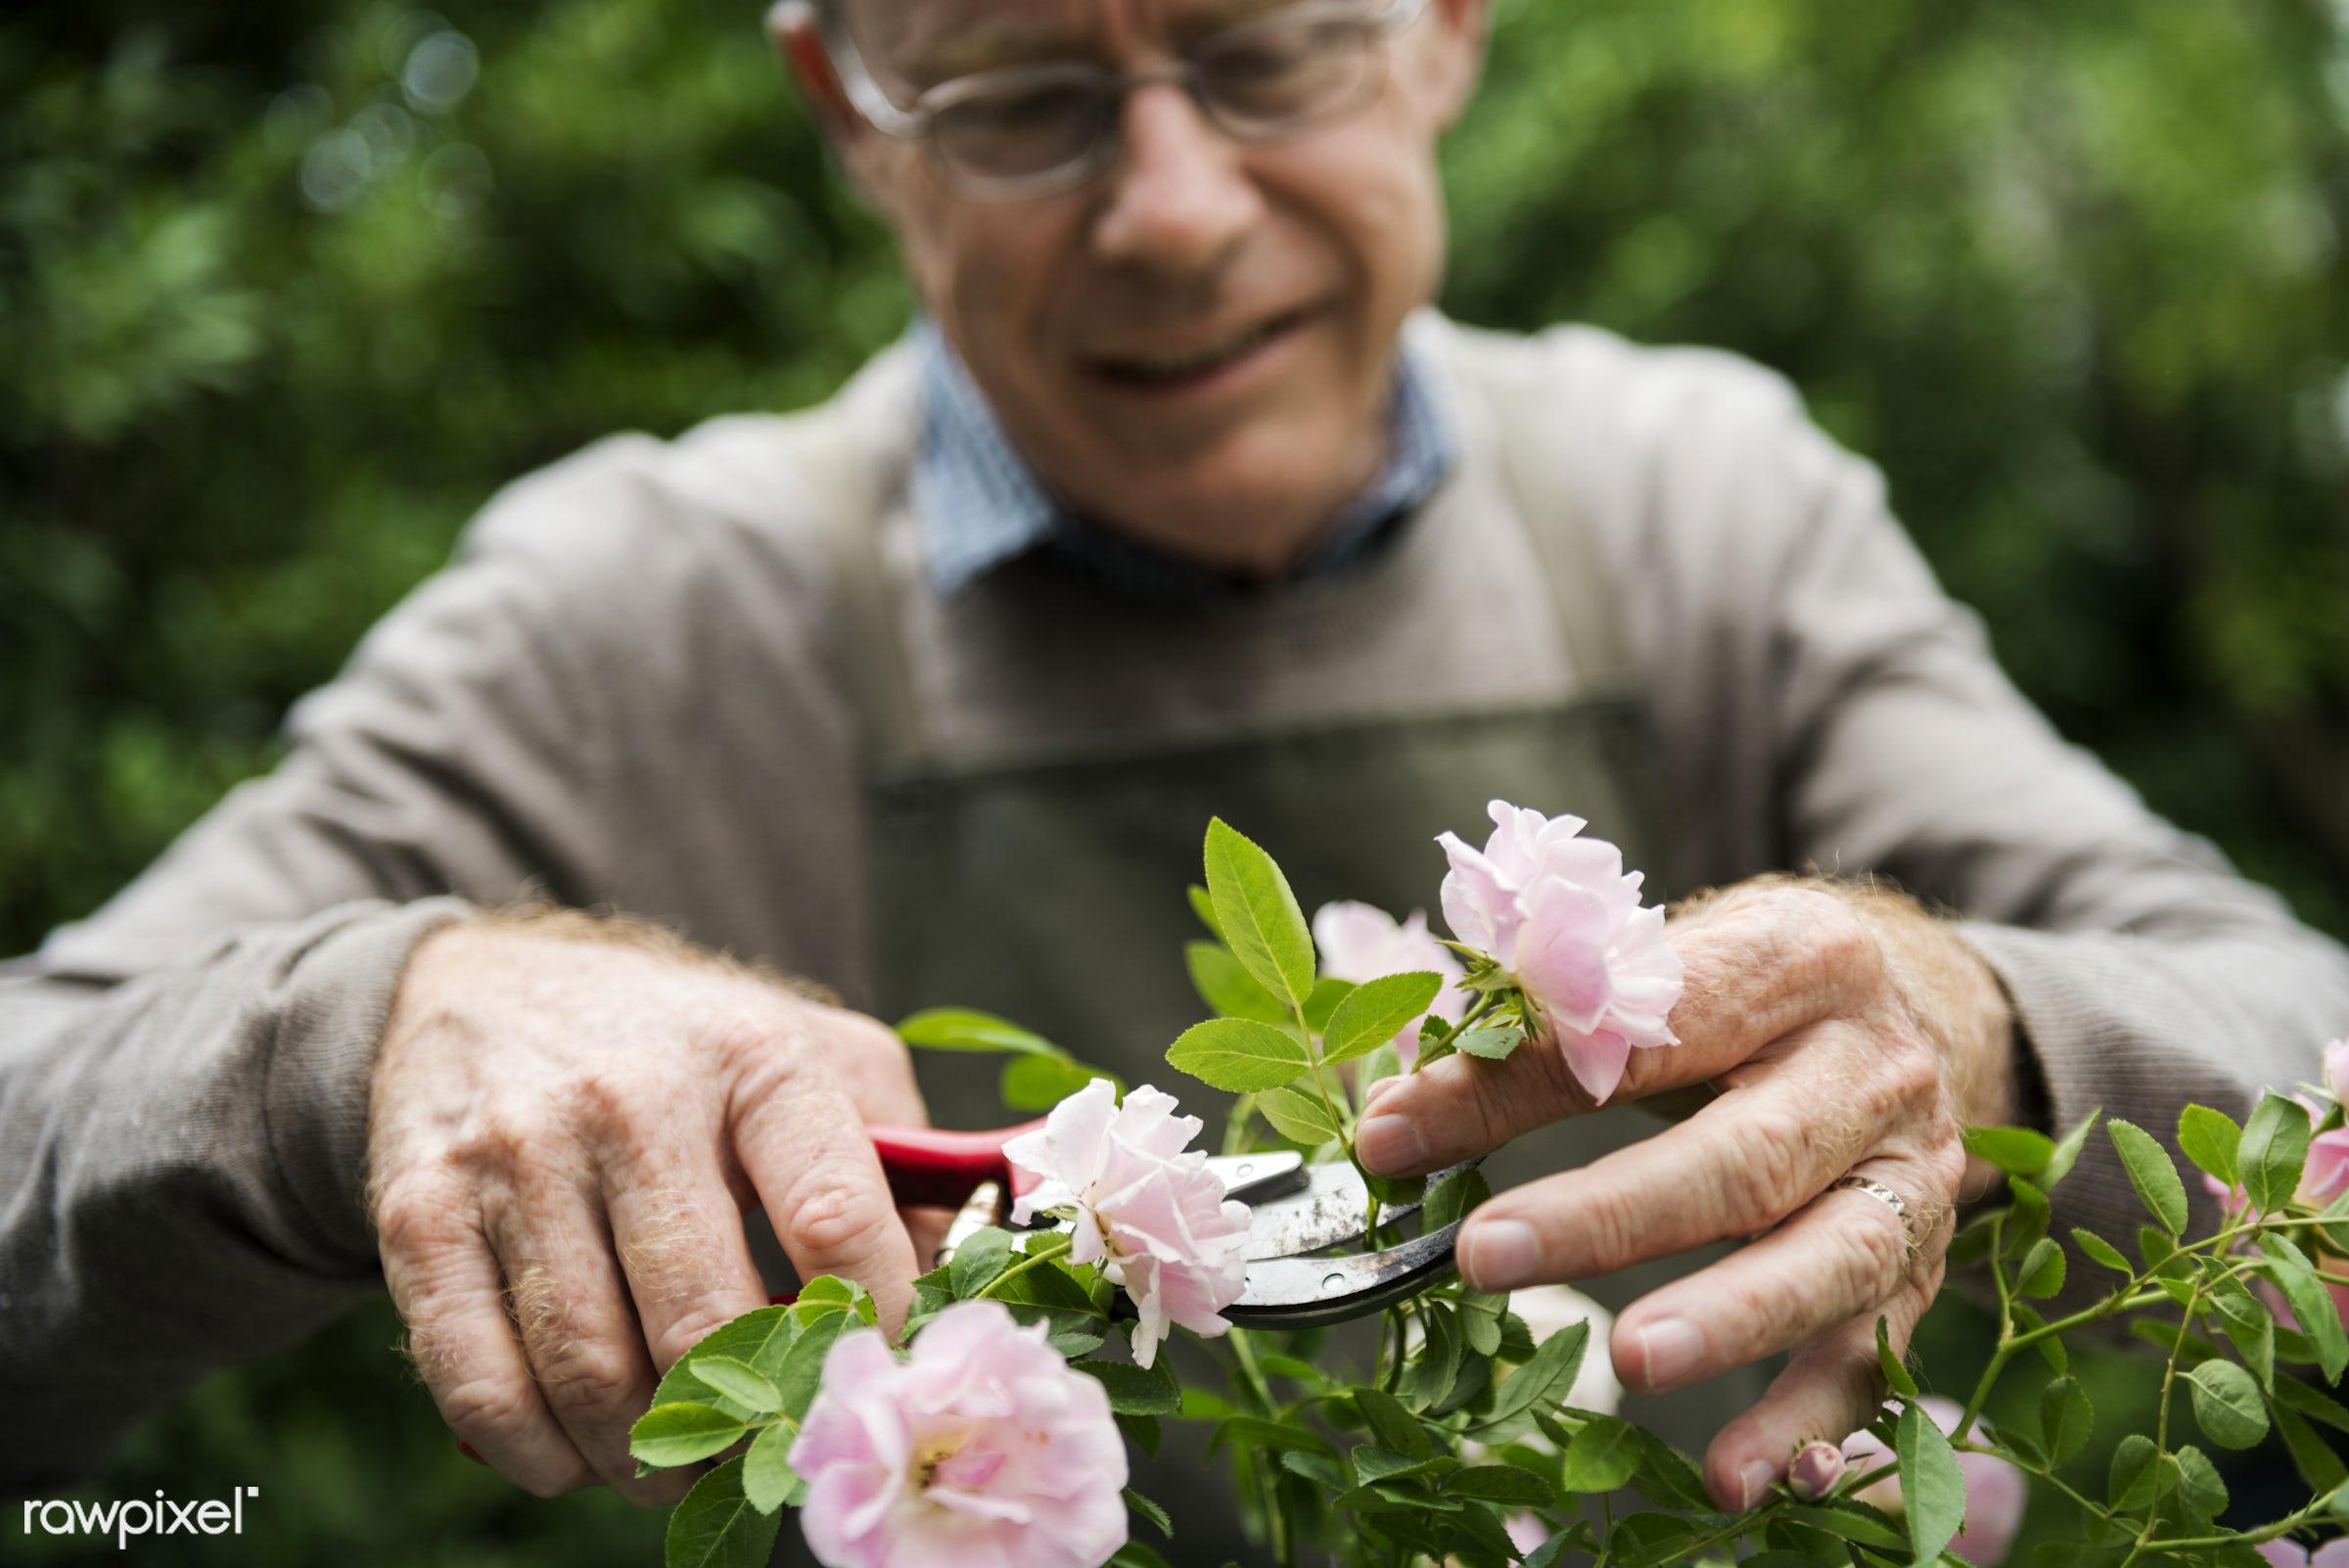 Elderly man flower gardening - people, man, elderly, senior, old, flower, garden, hobbies, green thumb, leisure, plant,...